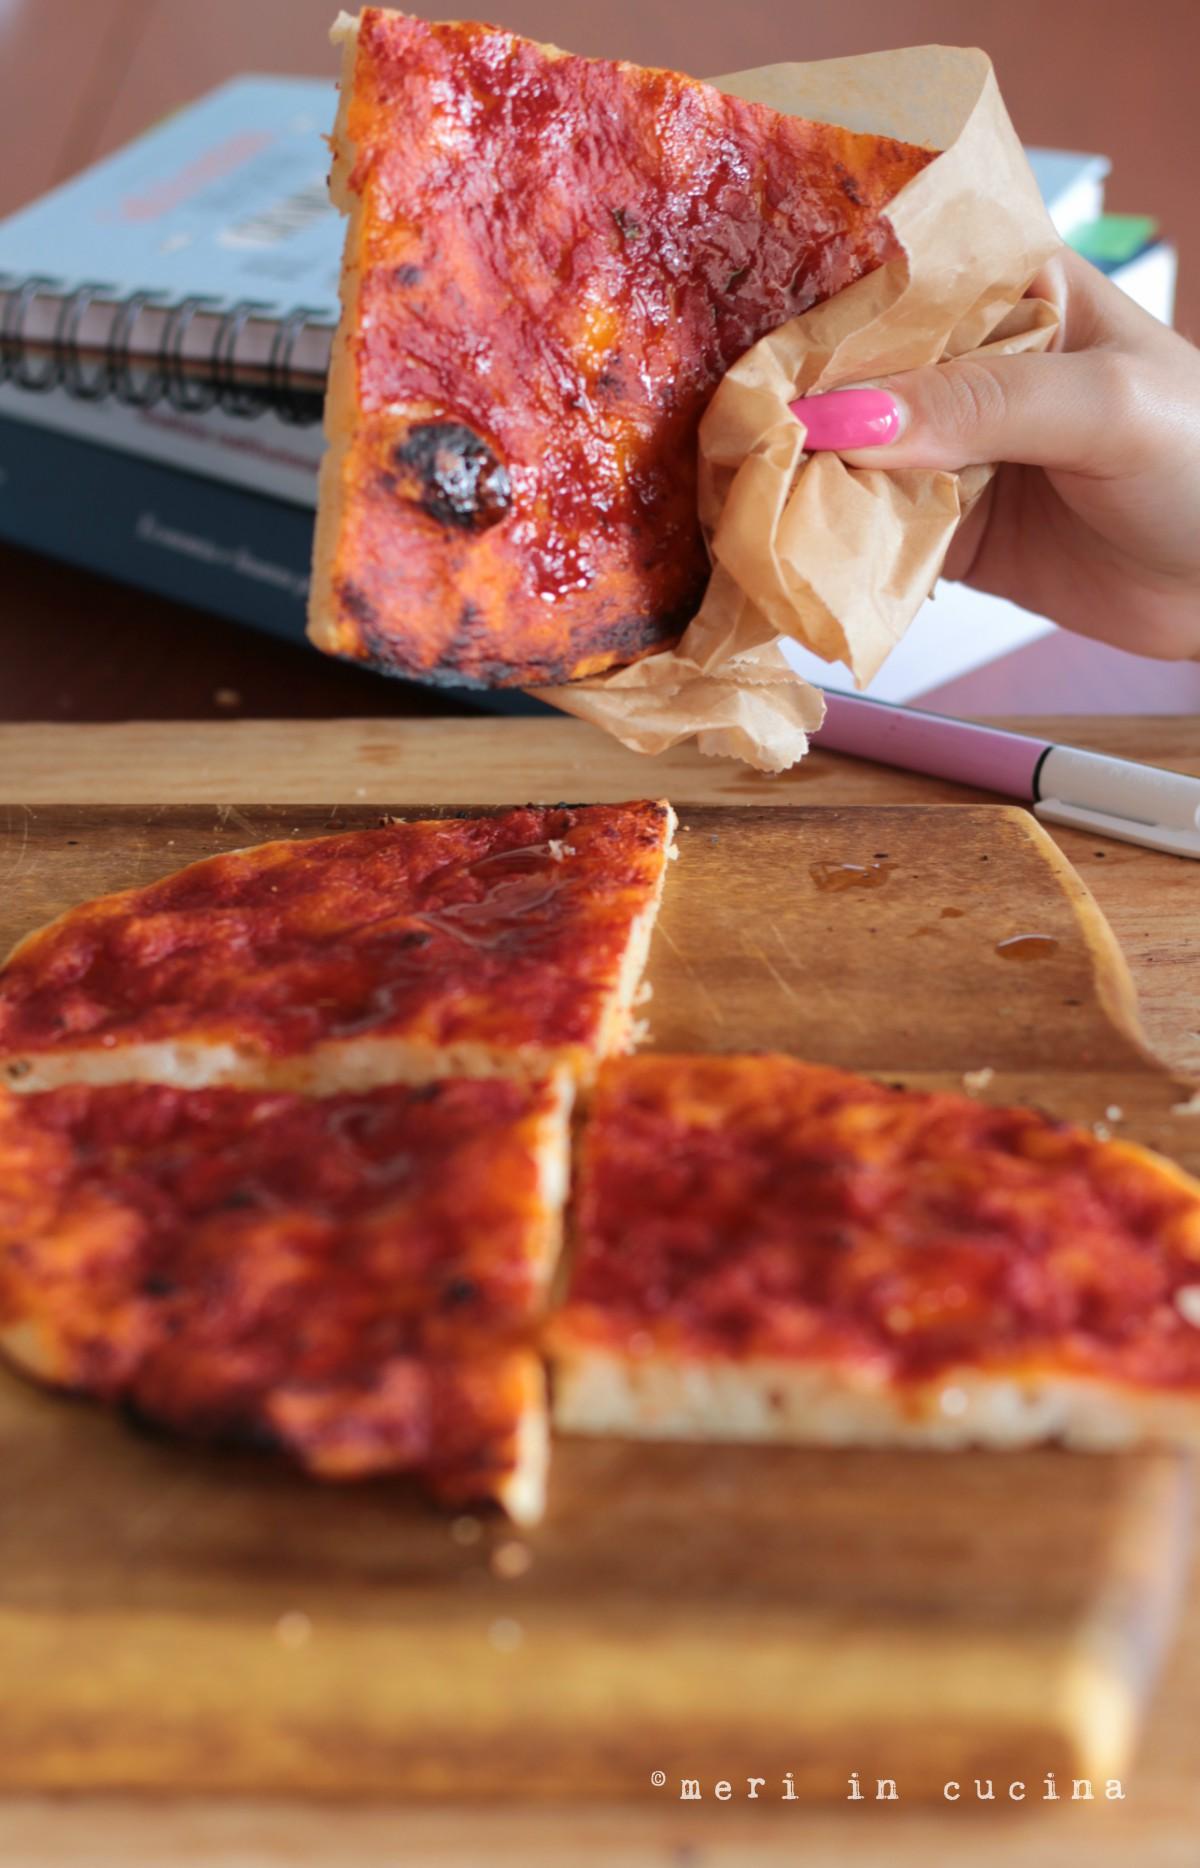 la pizzetta rossa, comfort food romano